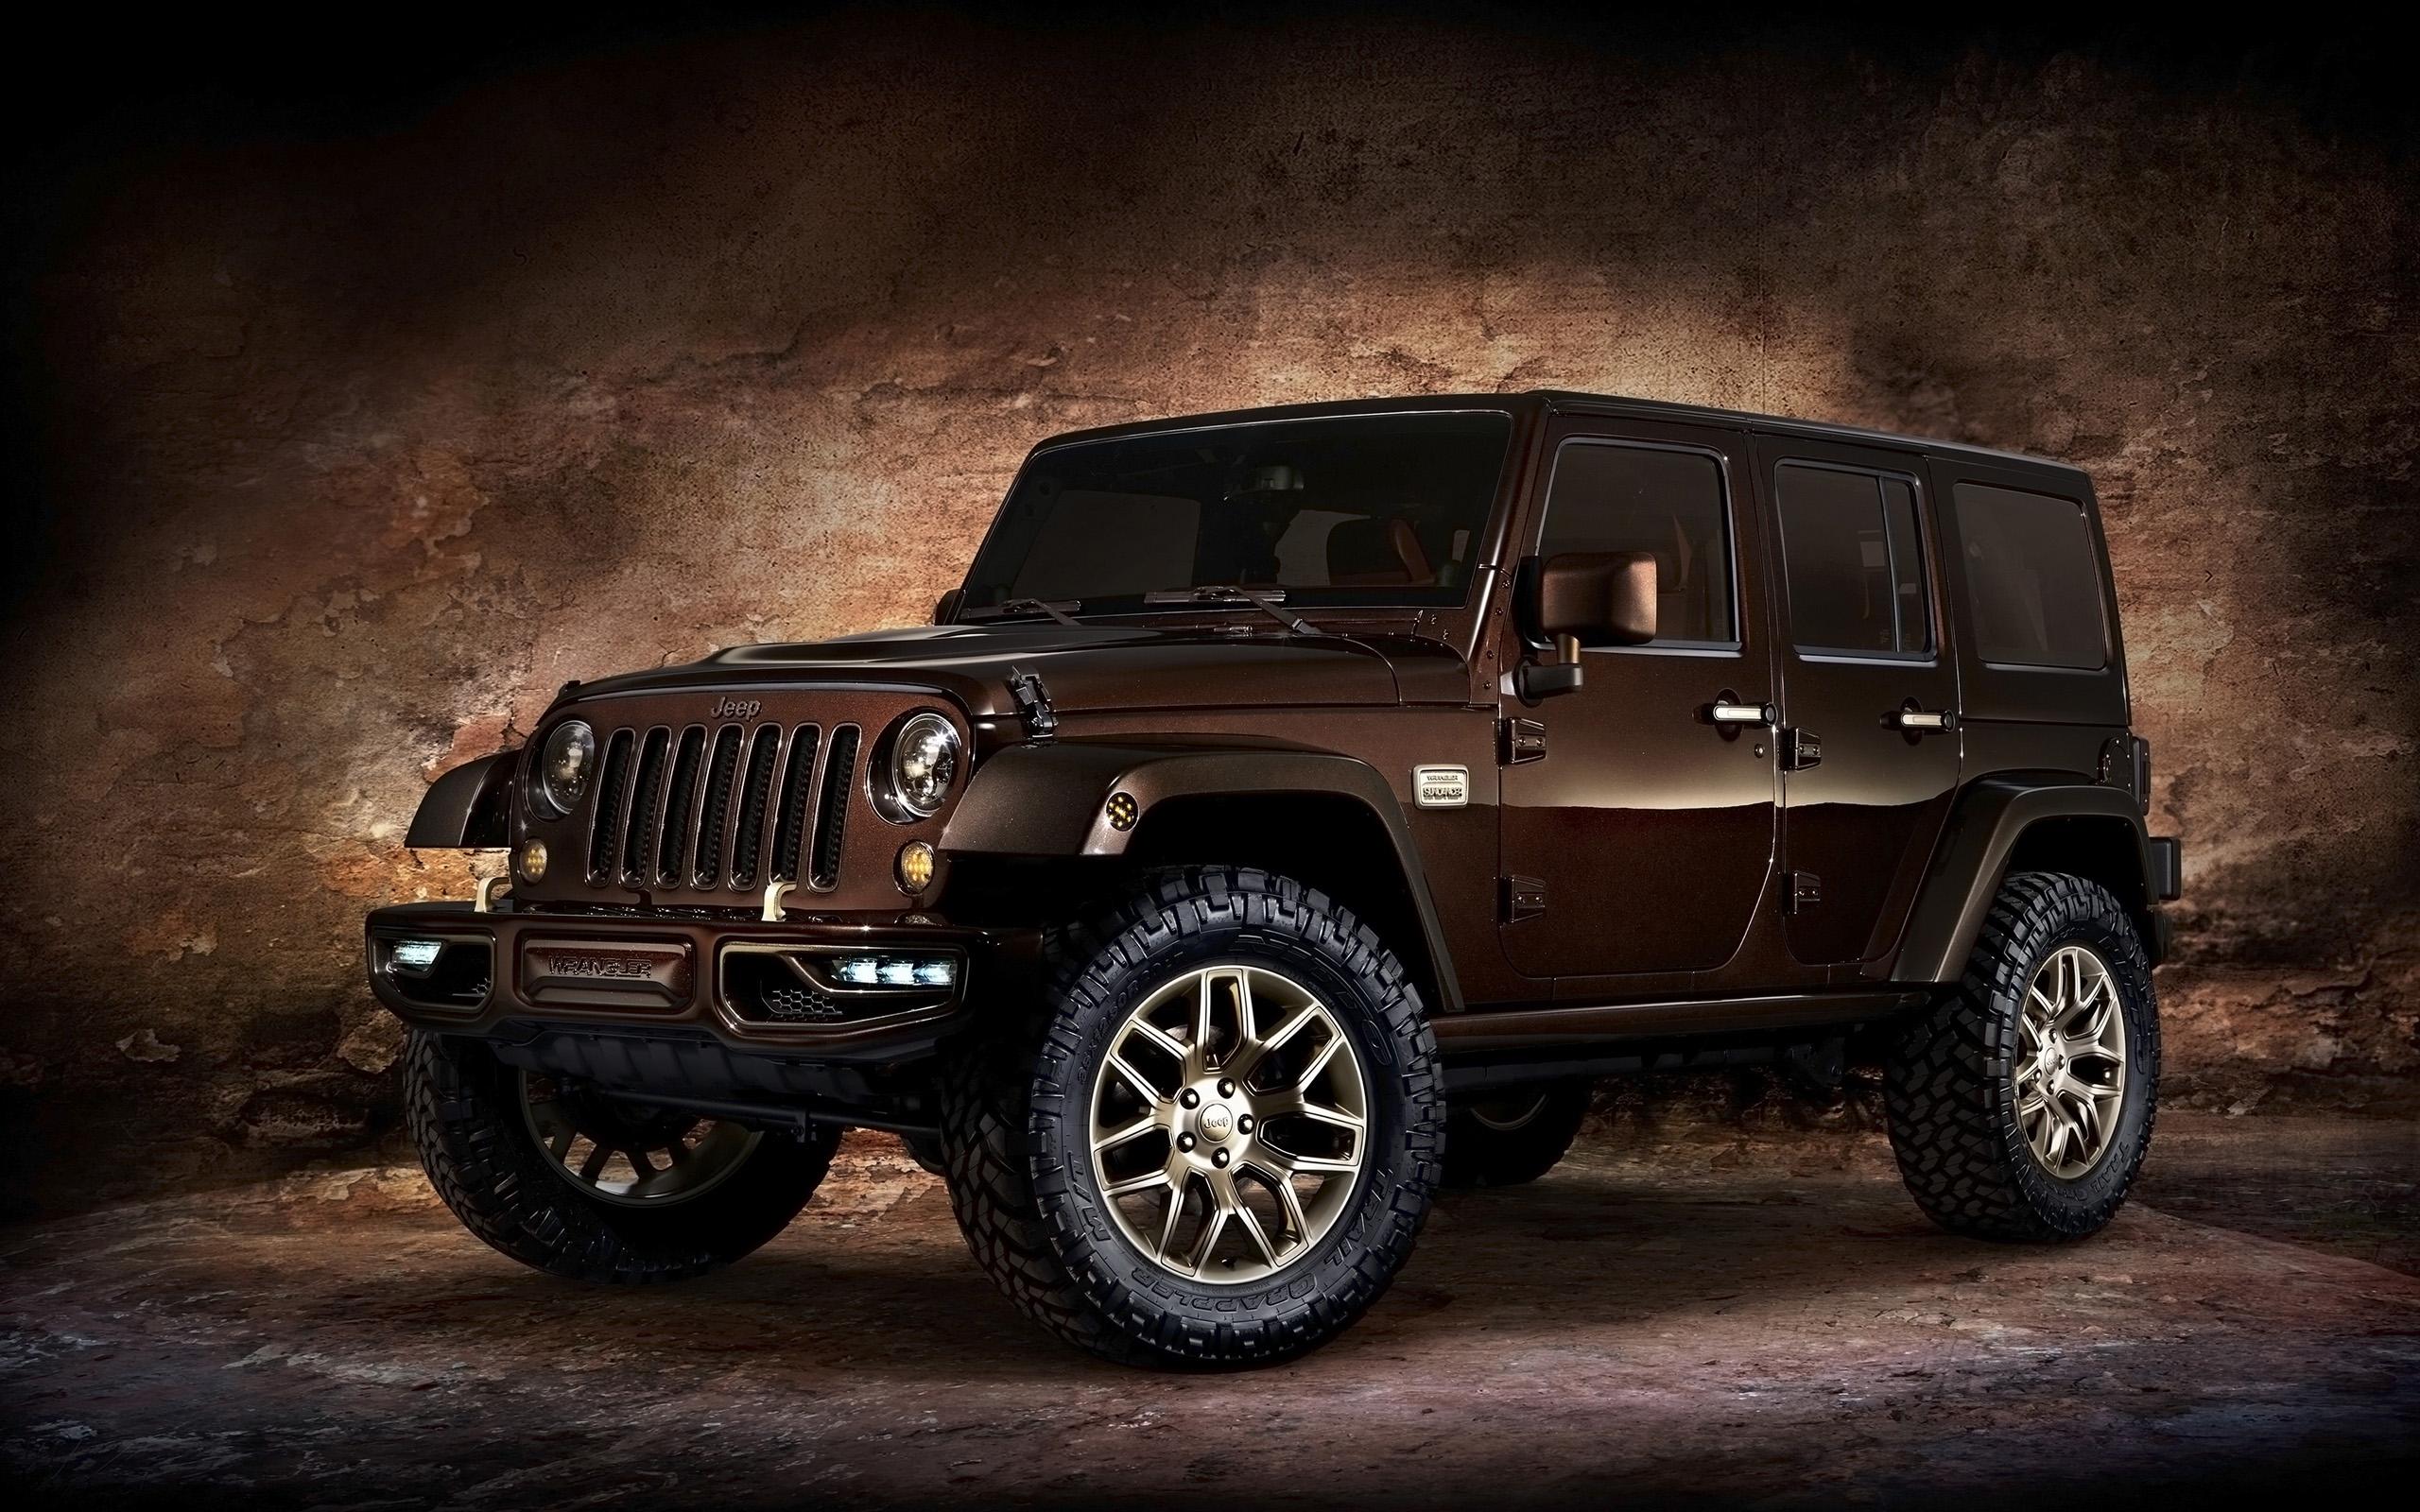 Jeep Wrangler Sundancer Concept Wide on Jeep Wrangler Renegade Concept